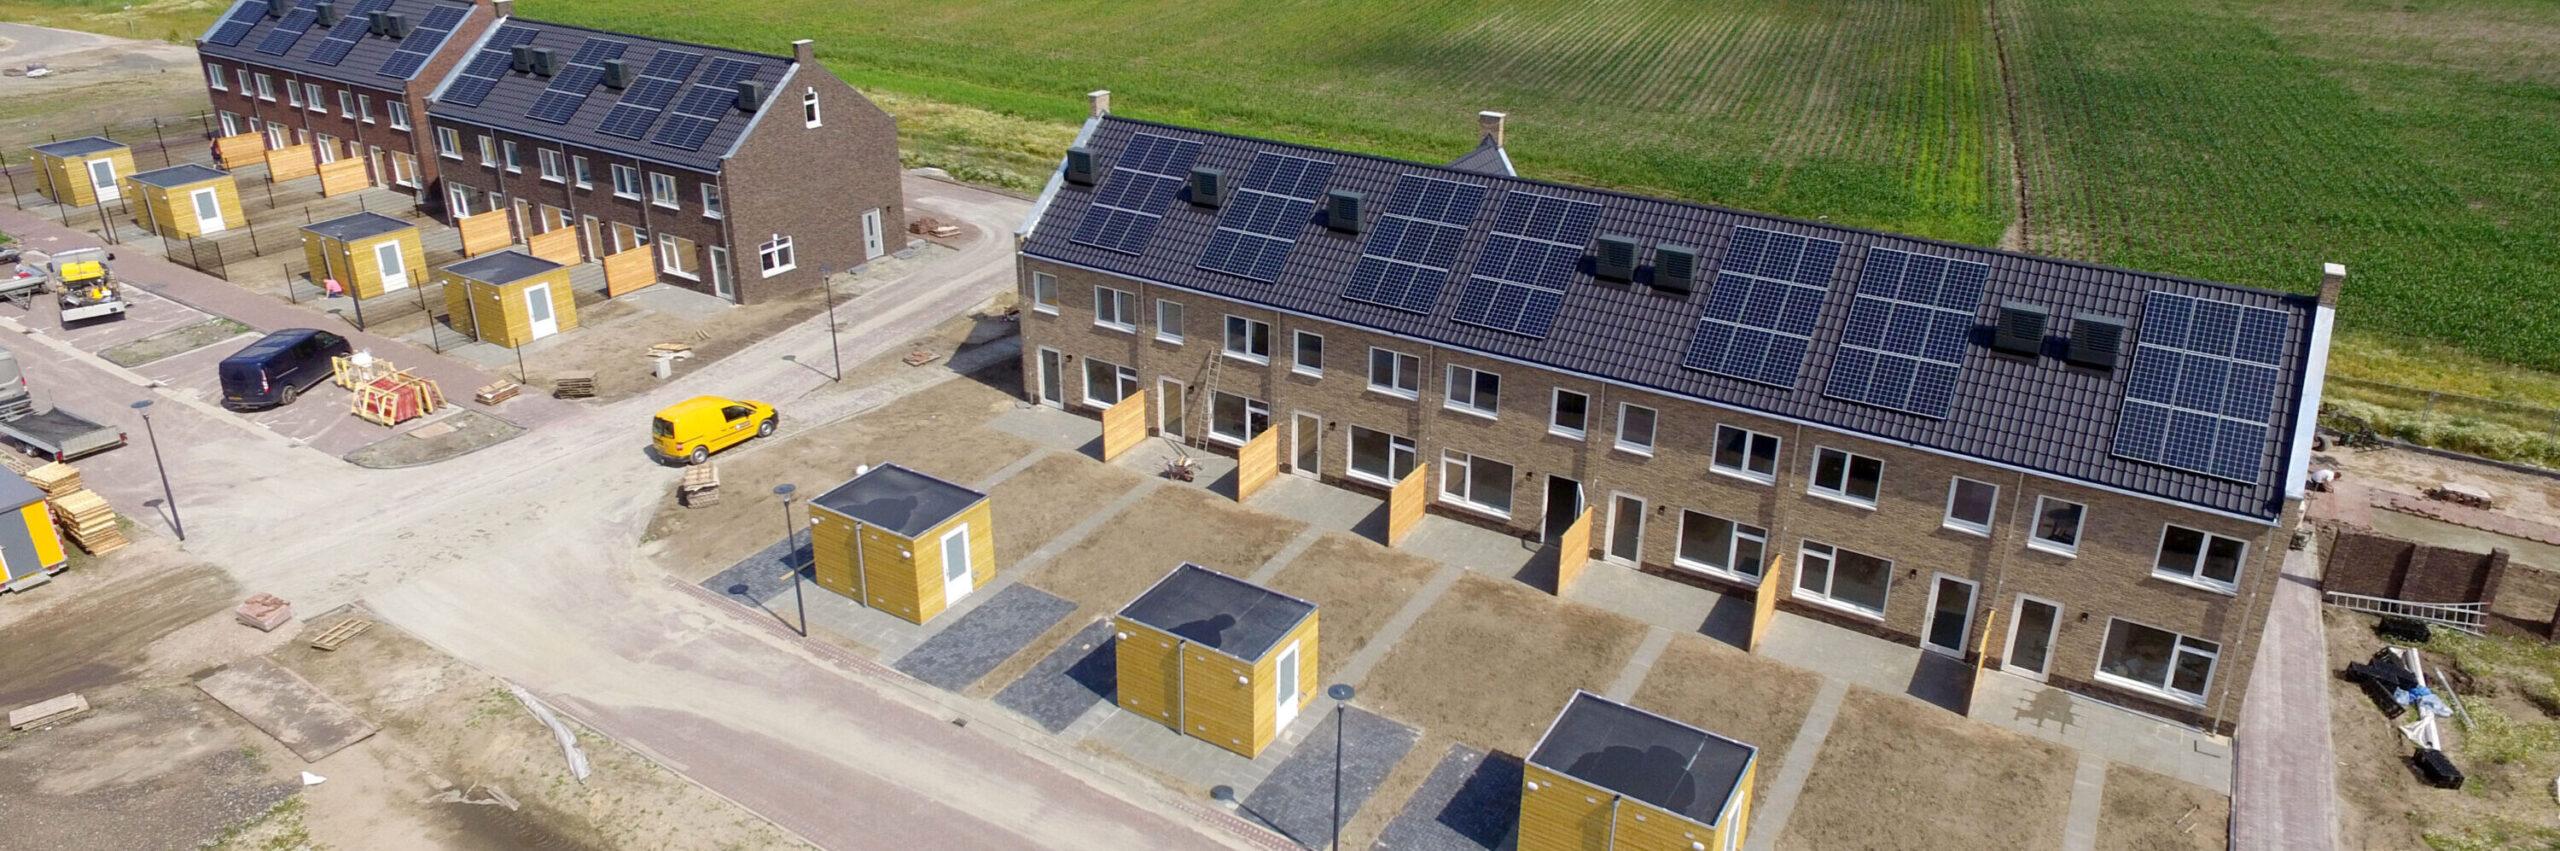 Project Steenbruggen nieuwbouw